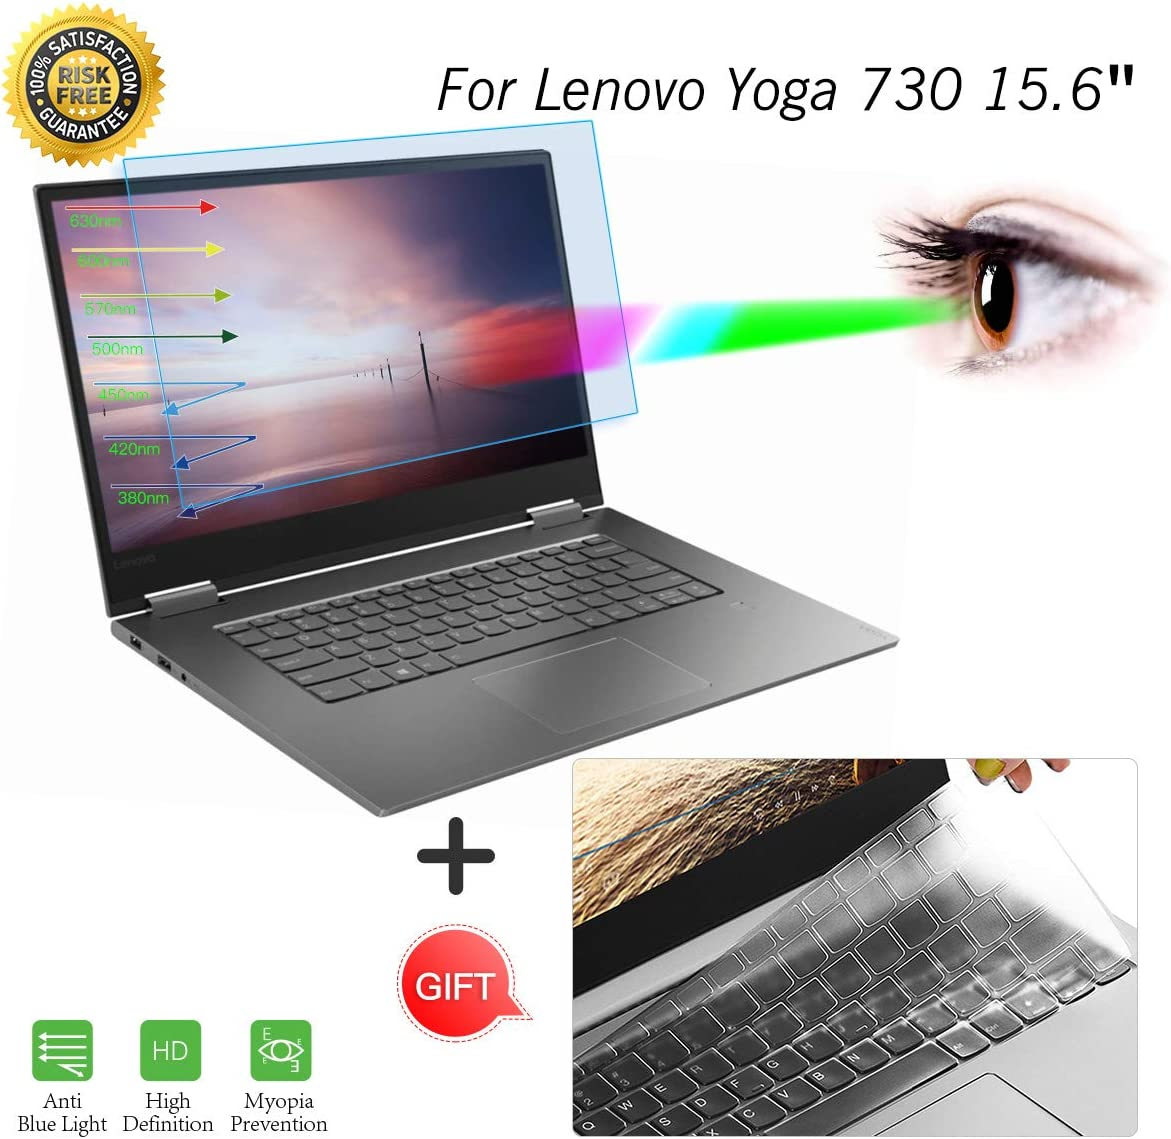 Anti Blue Light Screen Protector Filter For Lenovo Yoga C630 15.6 Inch Anti Gla